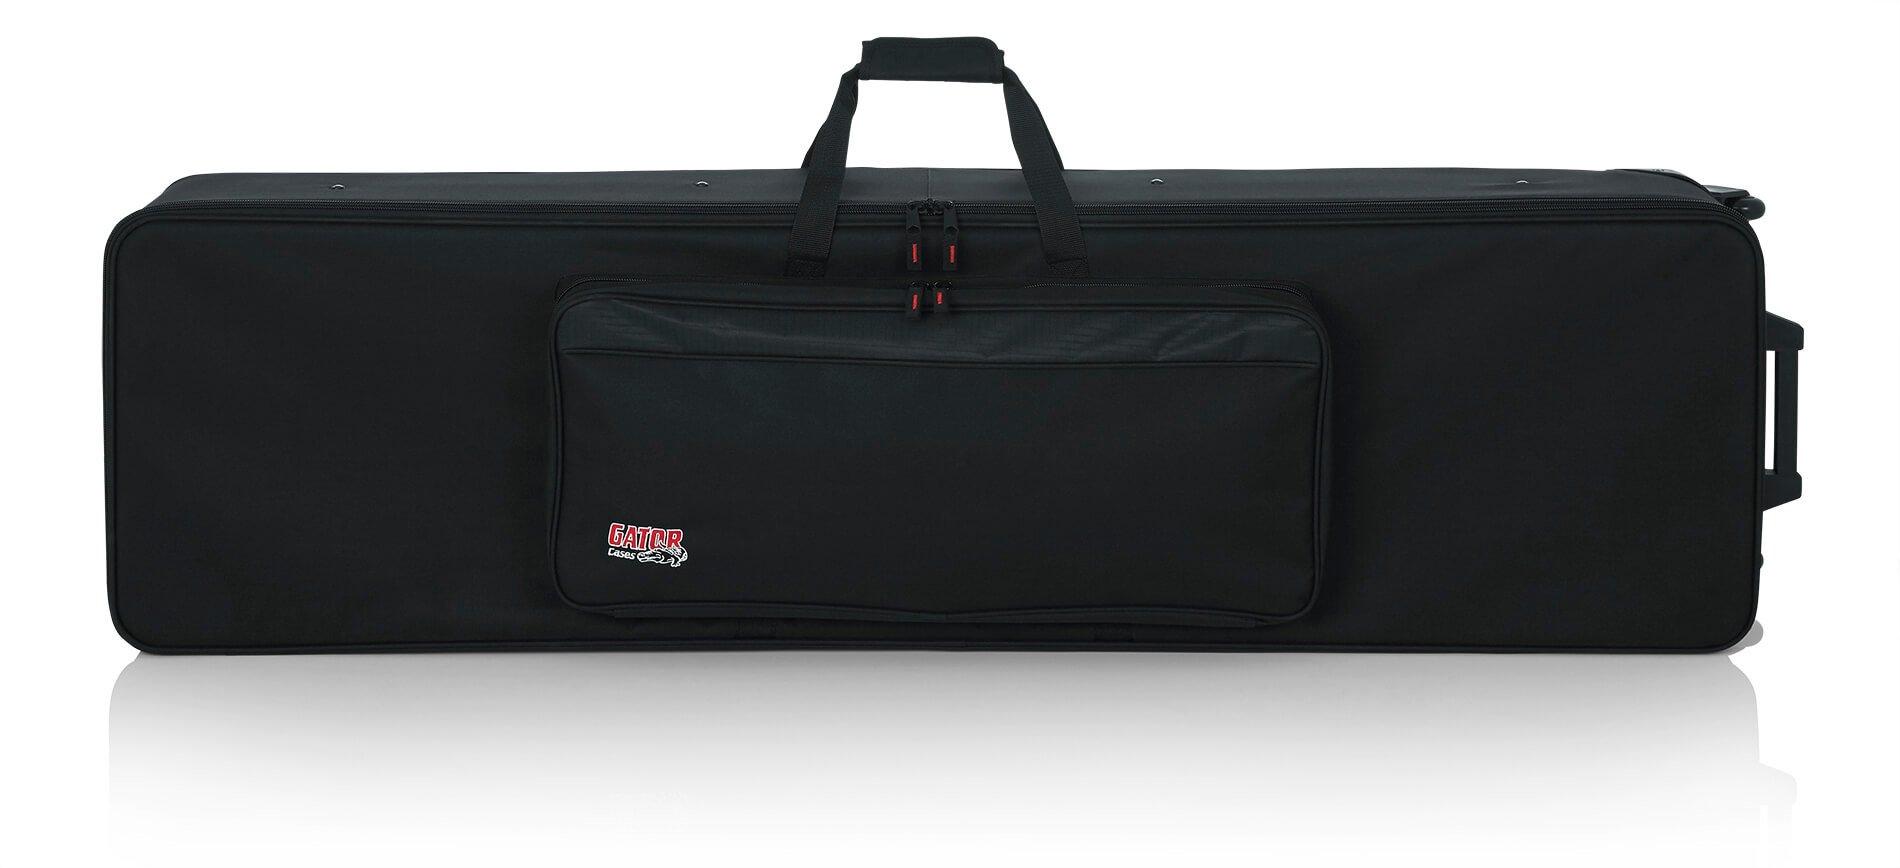 Gator GK-88 SLXL Rigid Lightweight Case w/ Wheels for Slim, Extra long 88 Note Keyboards